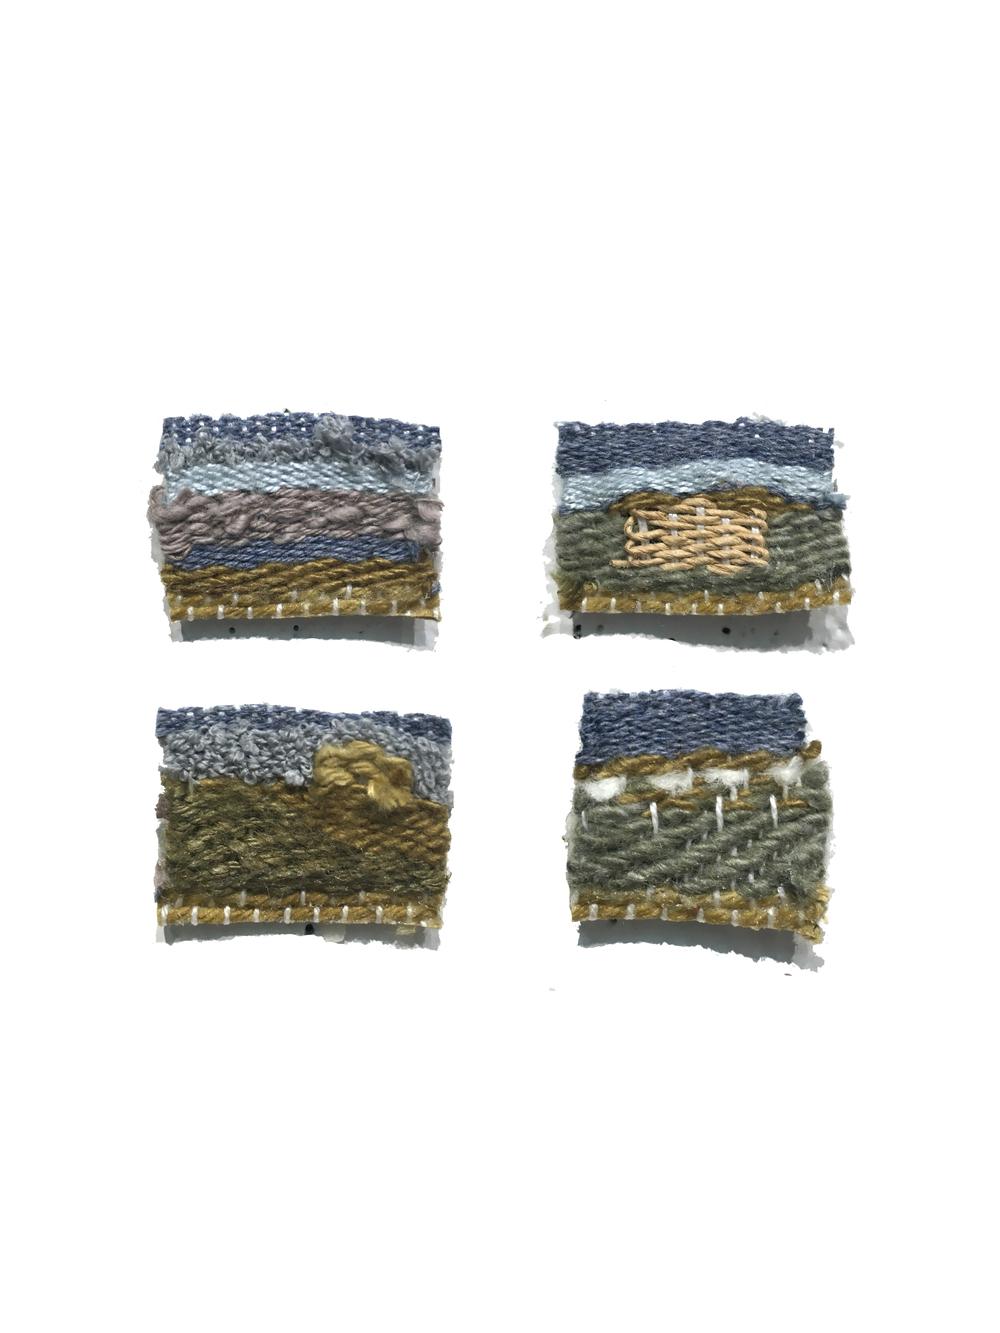 weaving1sample11.jpg